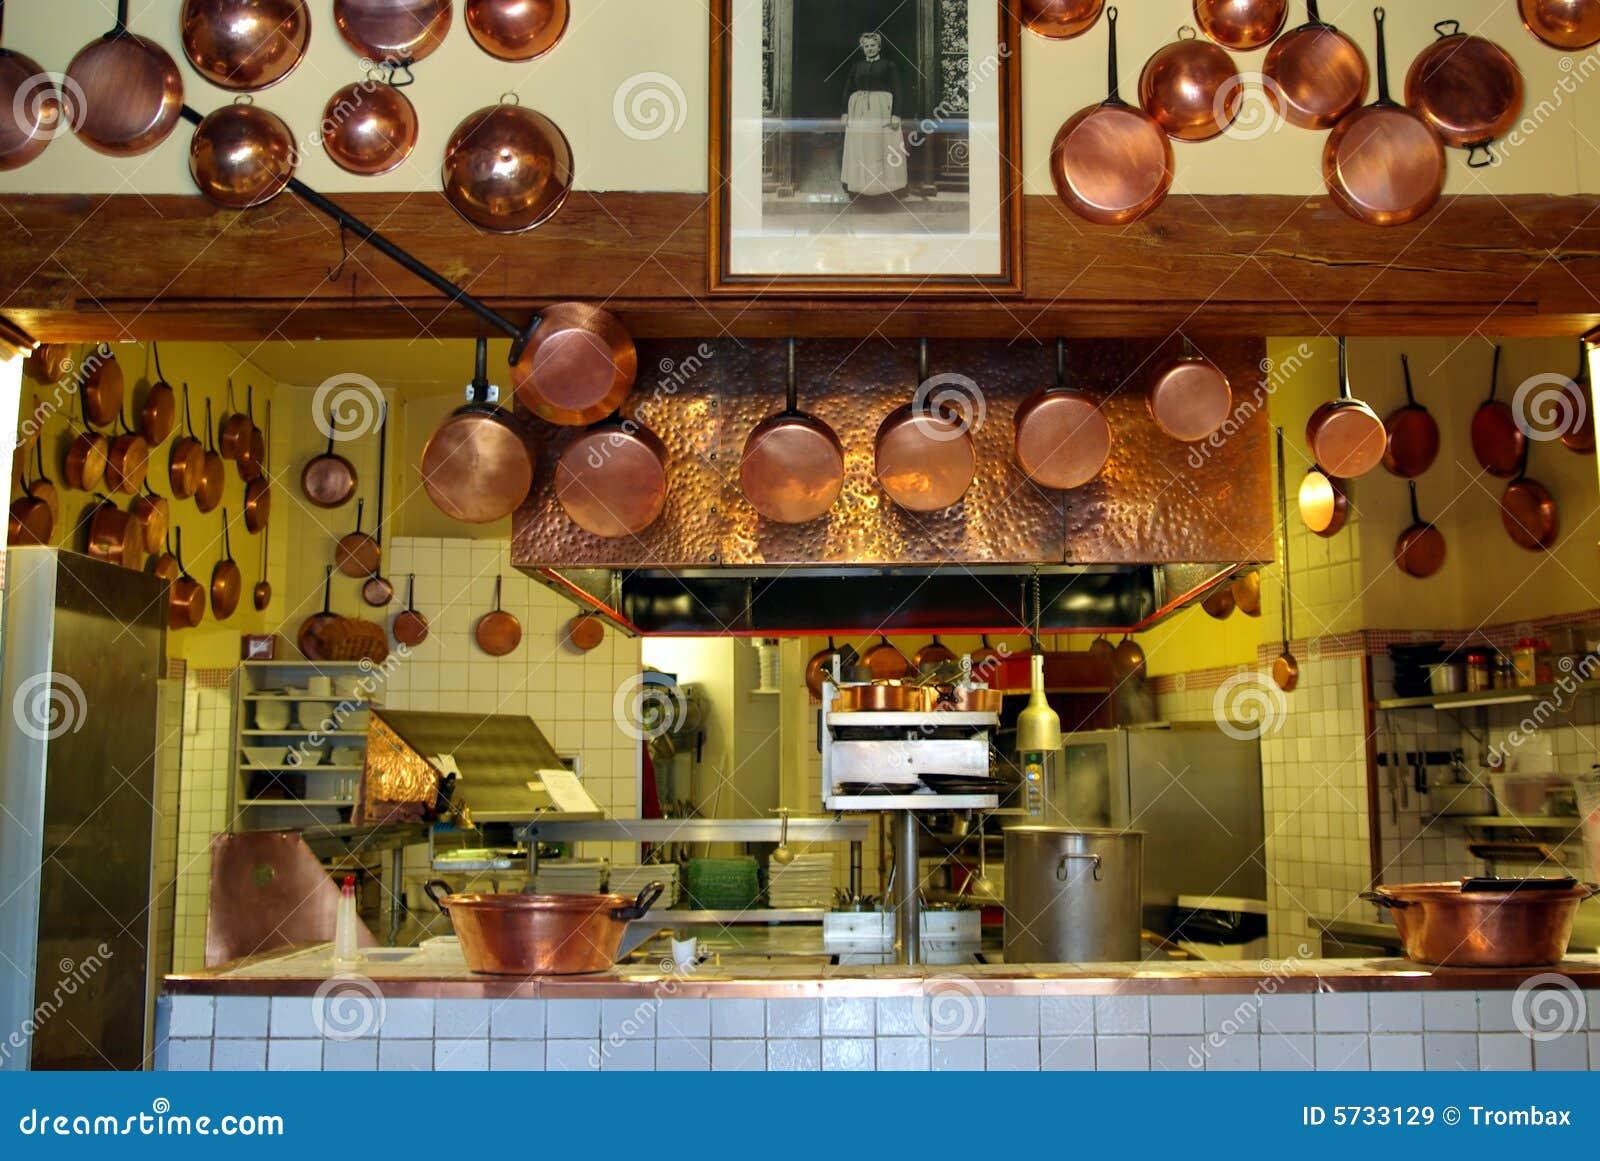 Cucina antica immagine stock. Immagine di tradizionale - 5733129